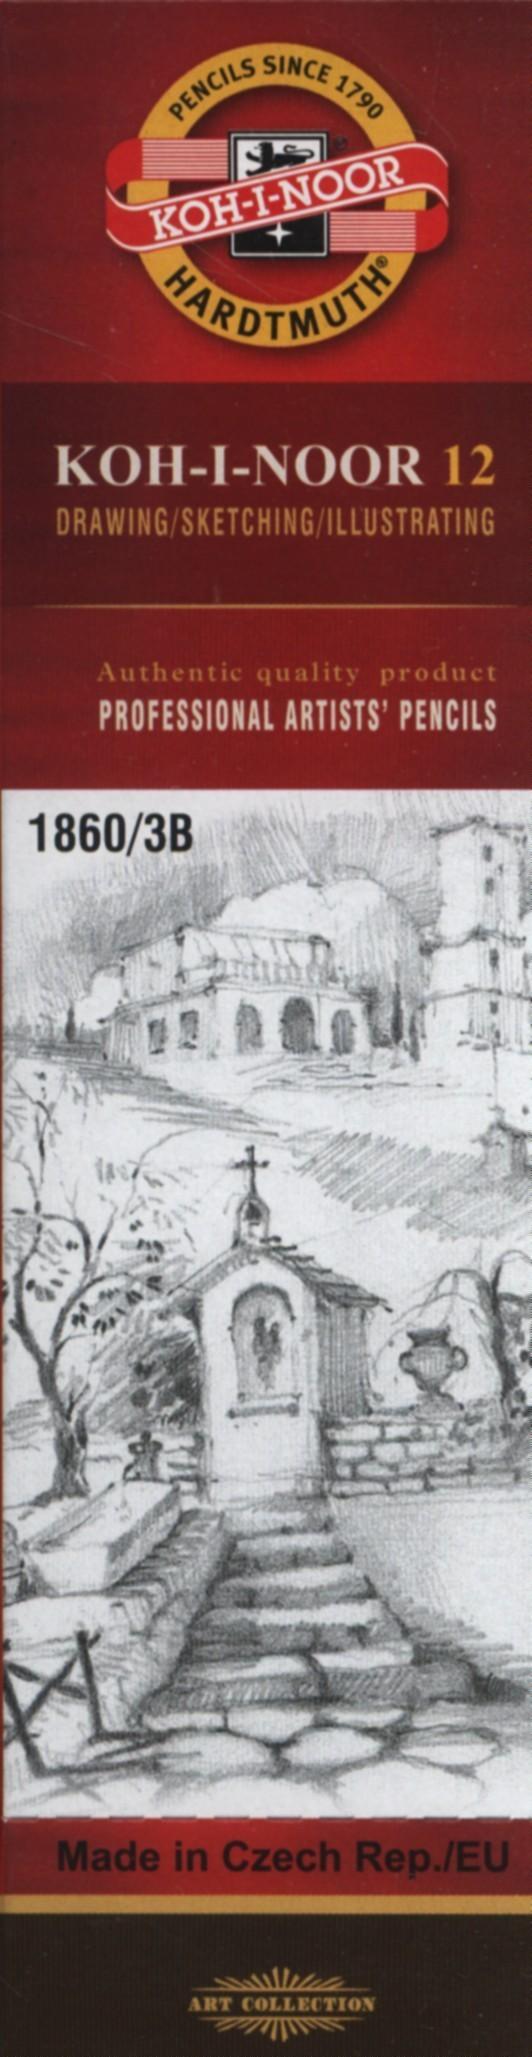 Koh-I-Noor Koh-I-Noor Ołówek grafitowy 1860/3B 12 szt